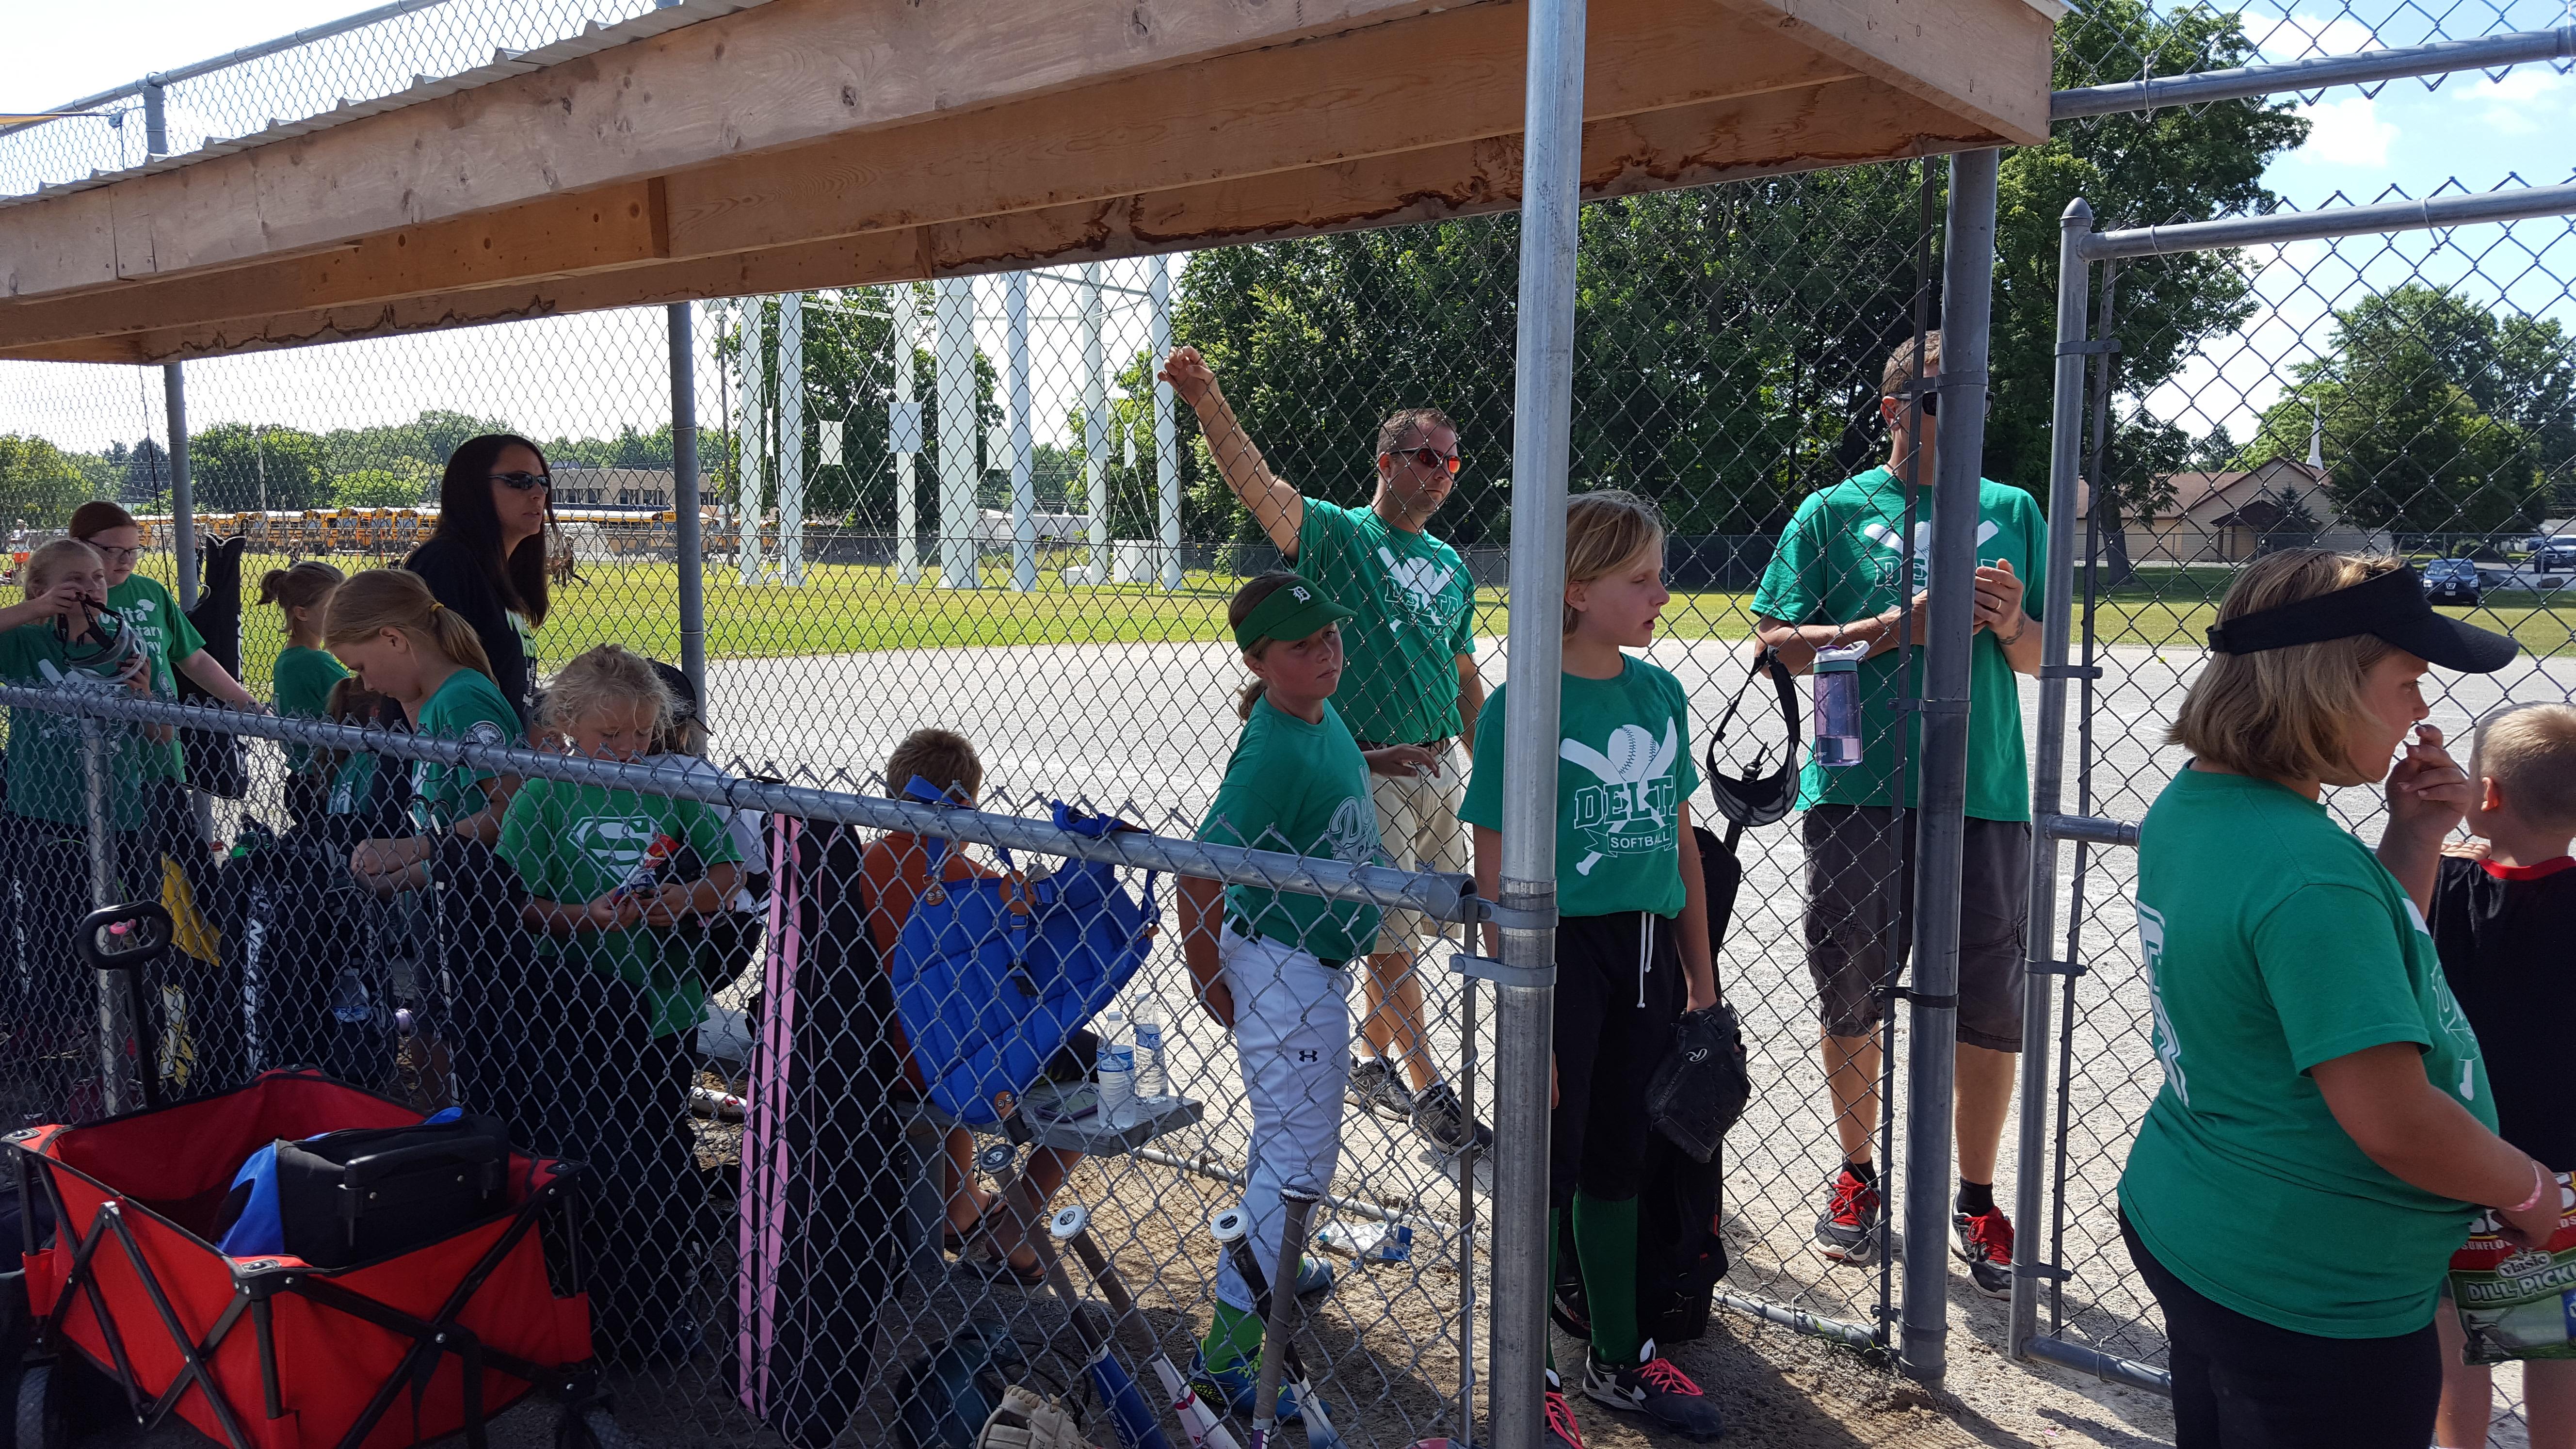 Softball Tournament July, 2016 - Swanton (26)